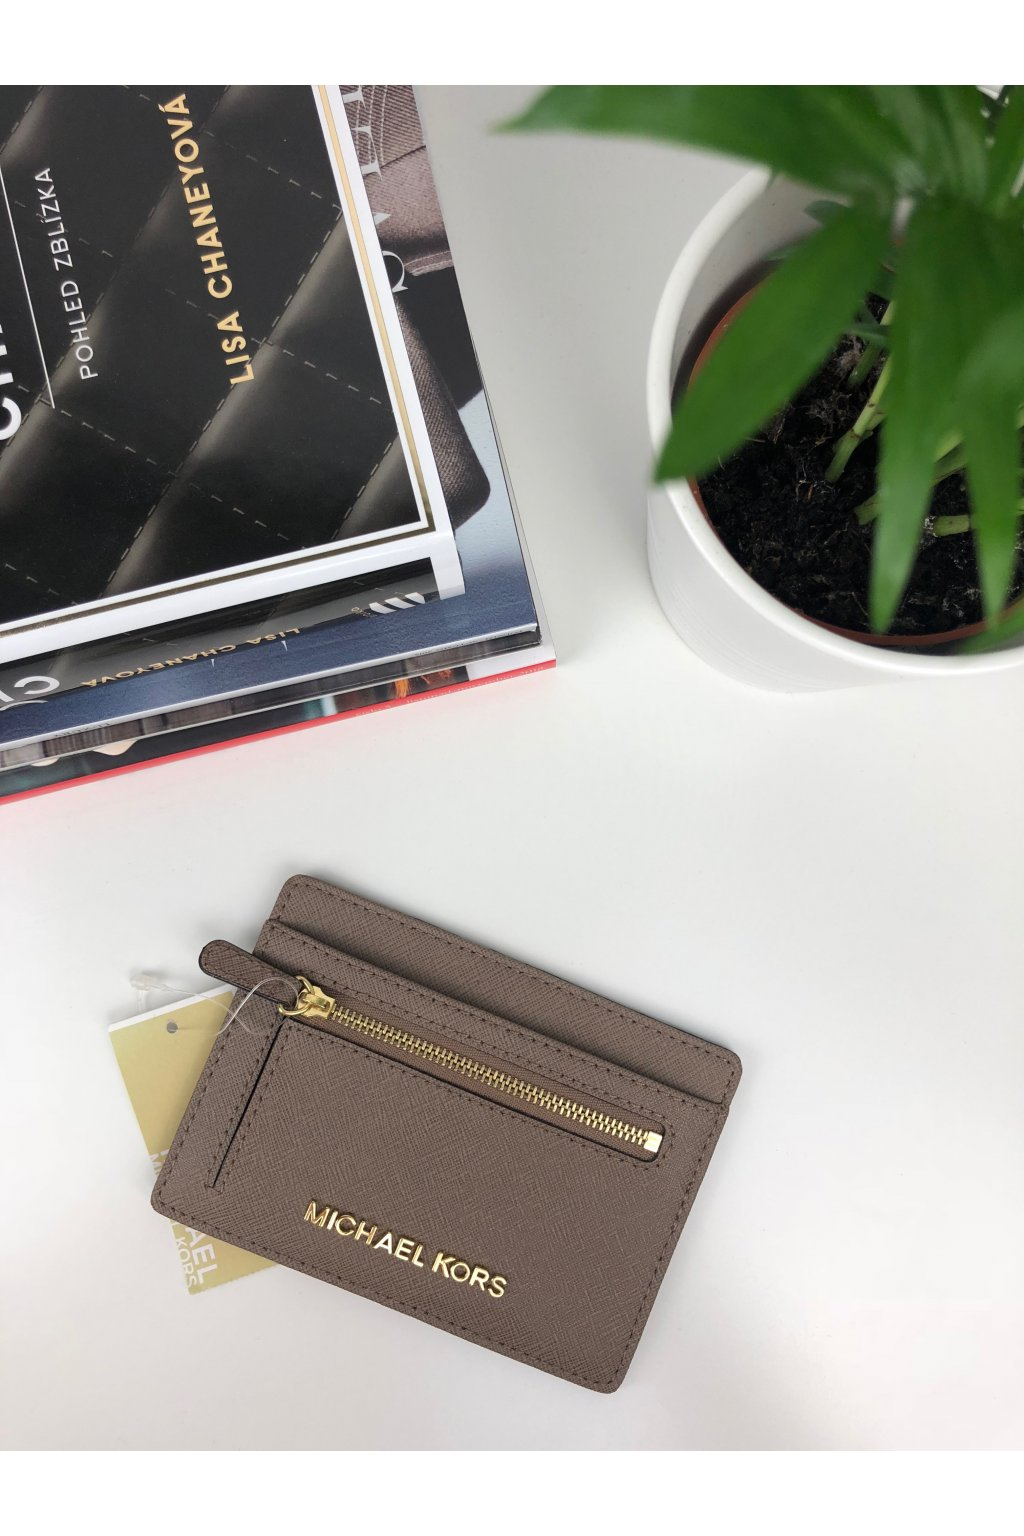 ... card holder jet set travel leather dar dune eshopat cz 3 3a65b996809